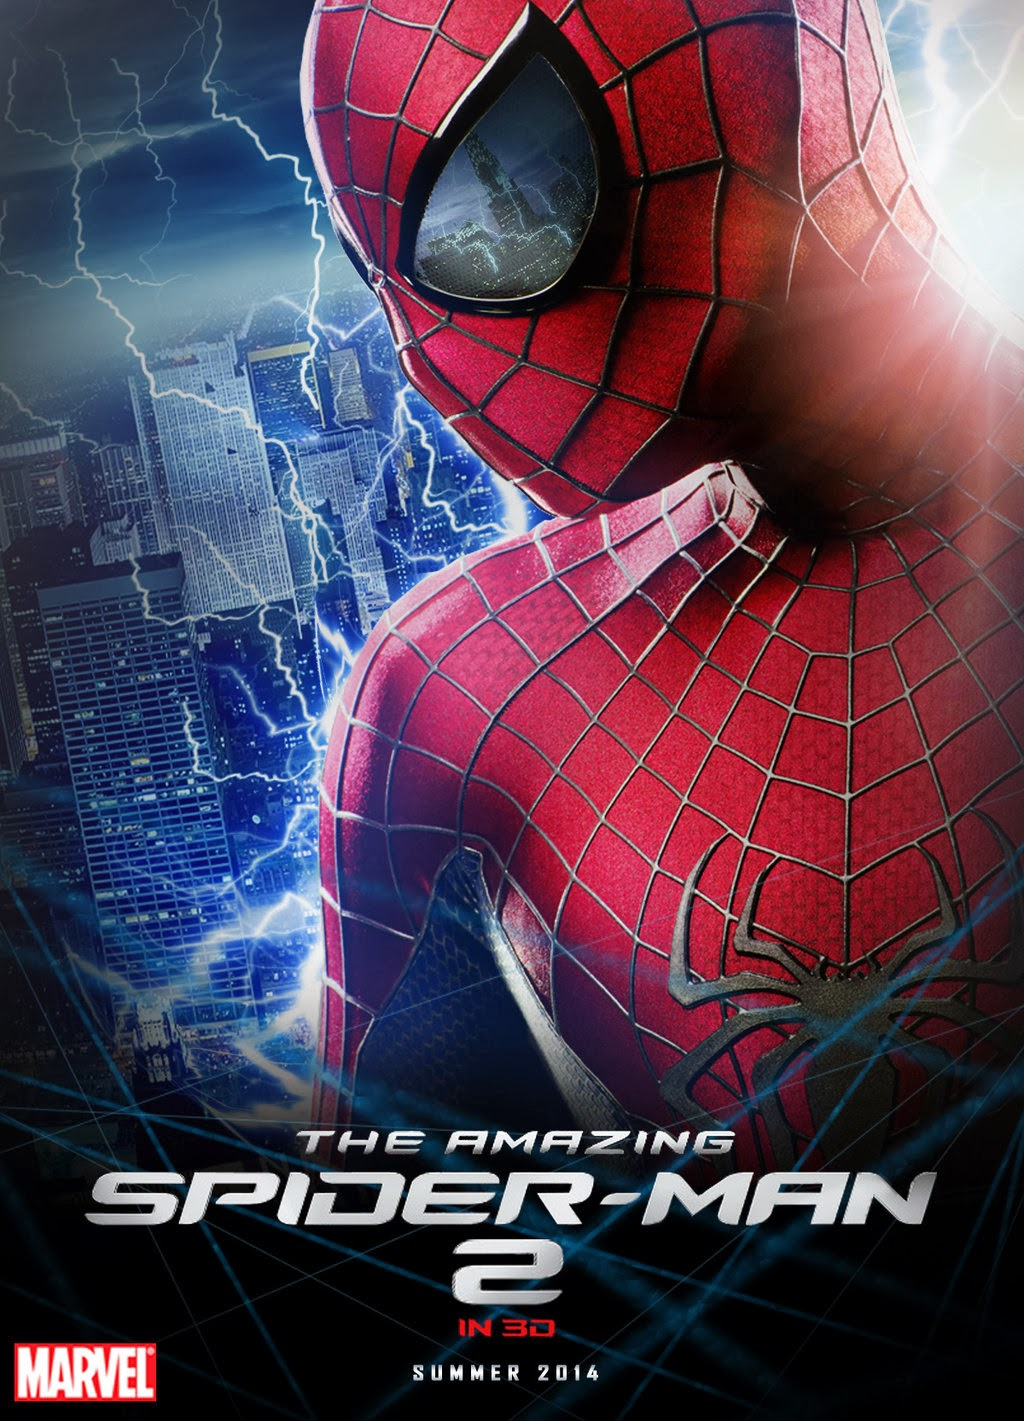 مشاهدة فيلم the amazing spider man 2 مترجم اون لاين